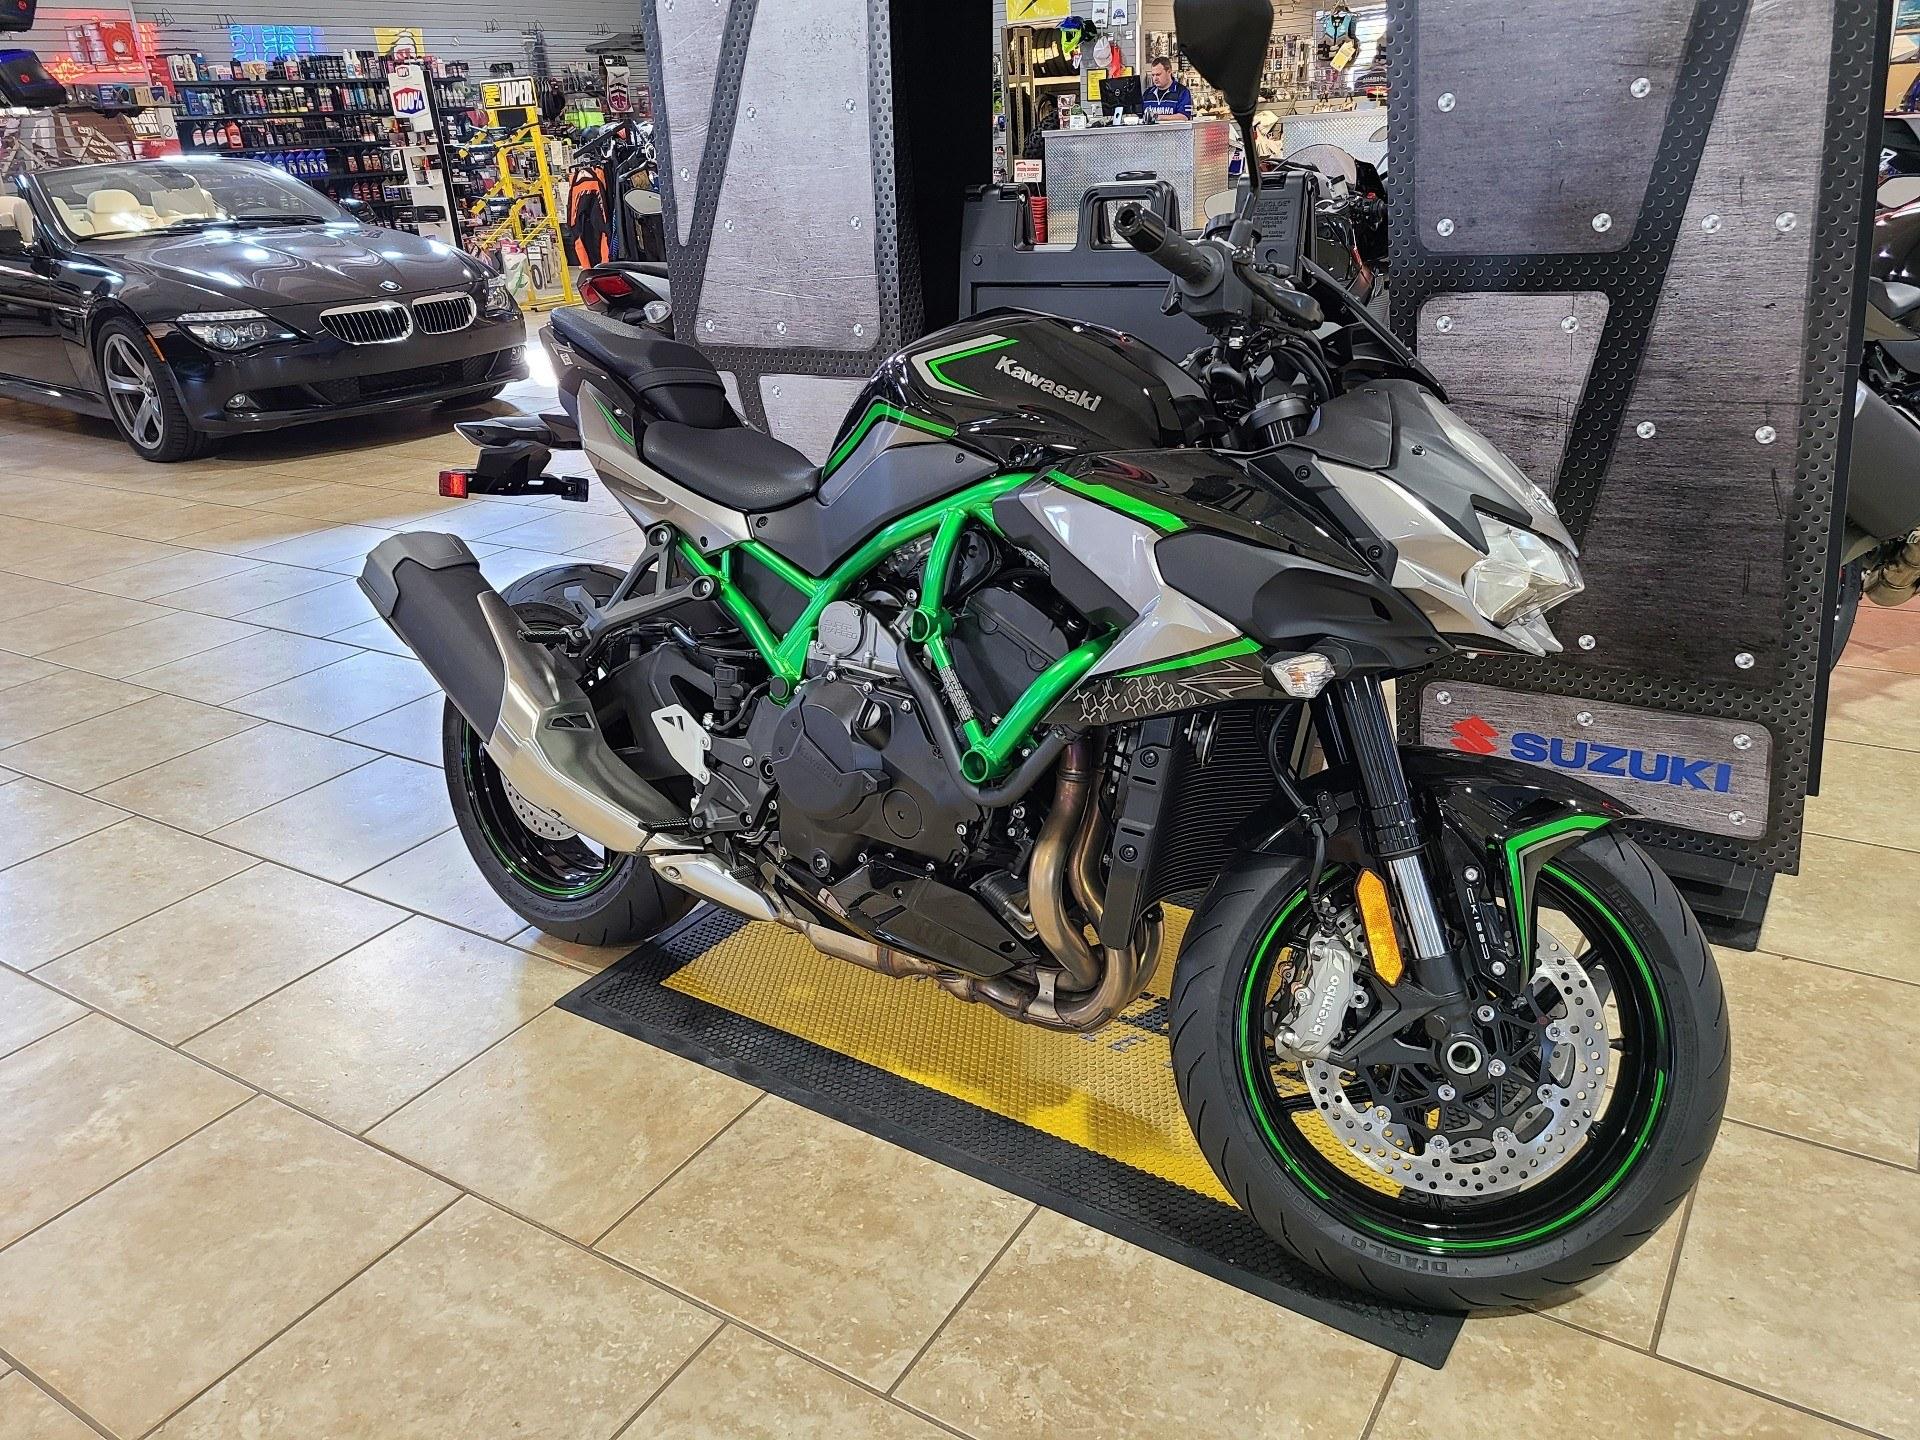 All New 2020 Kawasaki Z H2 | First Look Design at EICMA